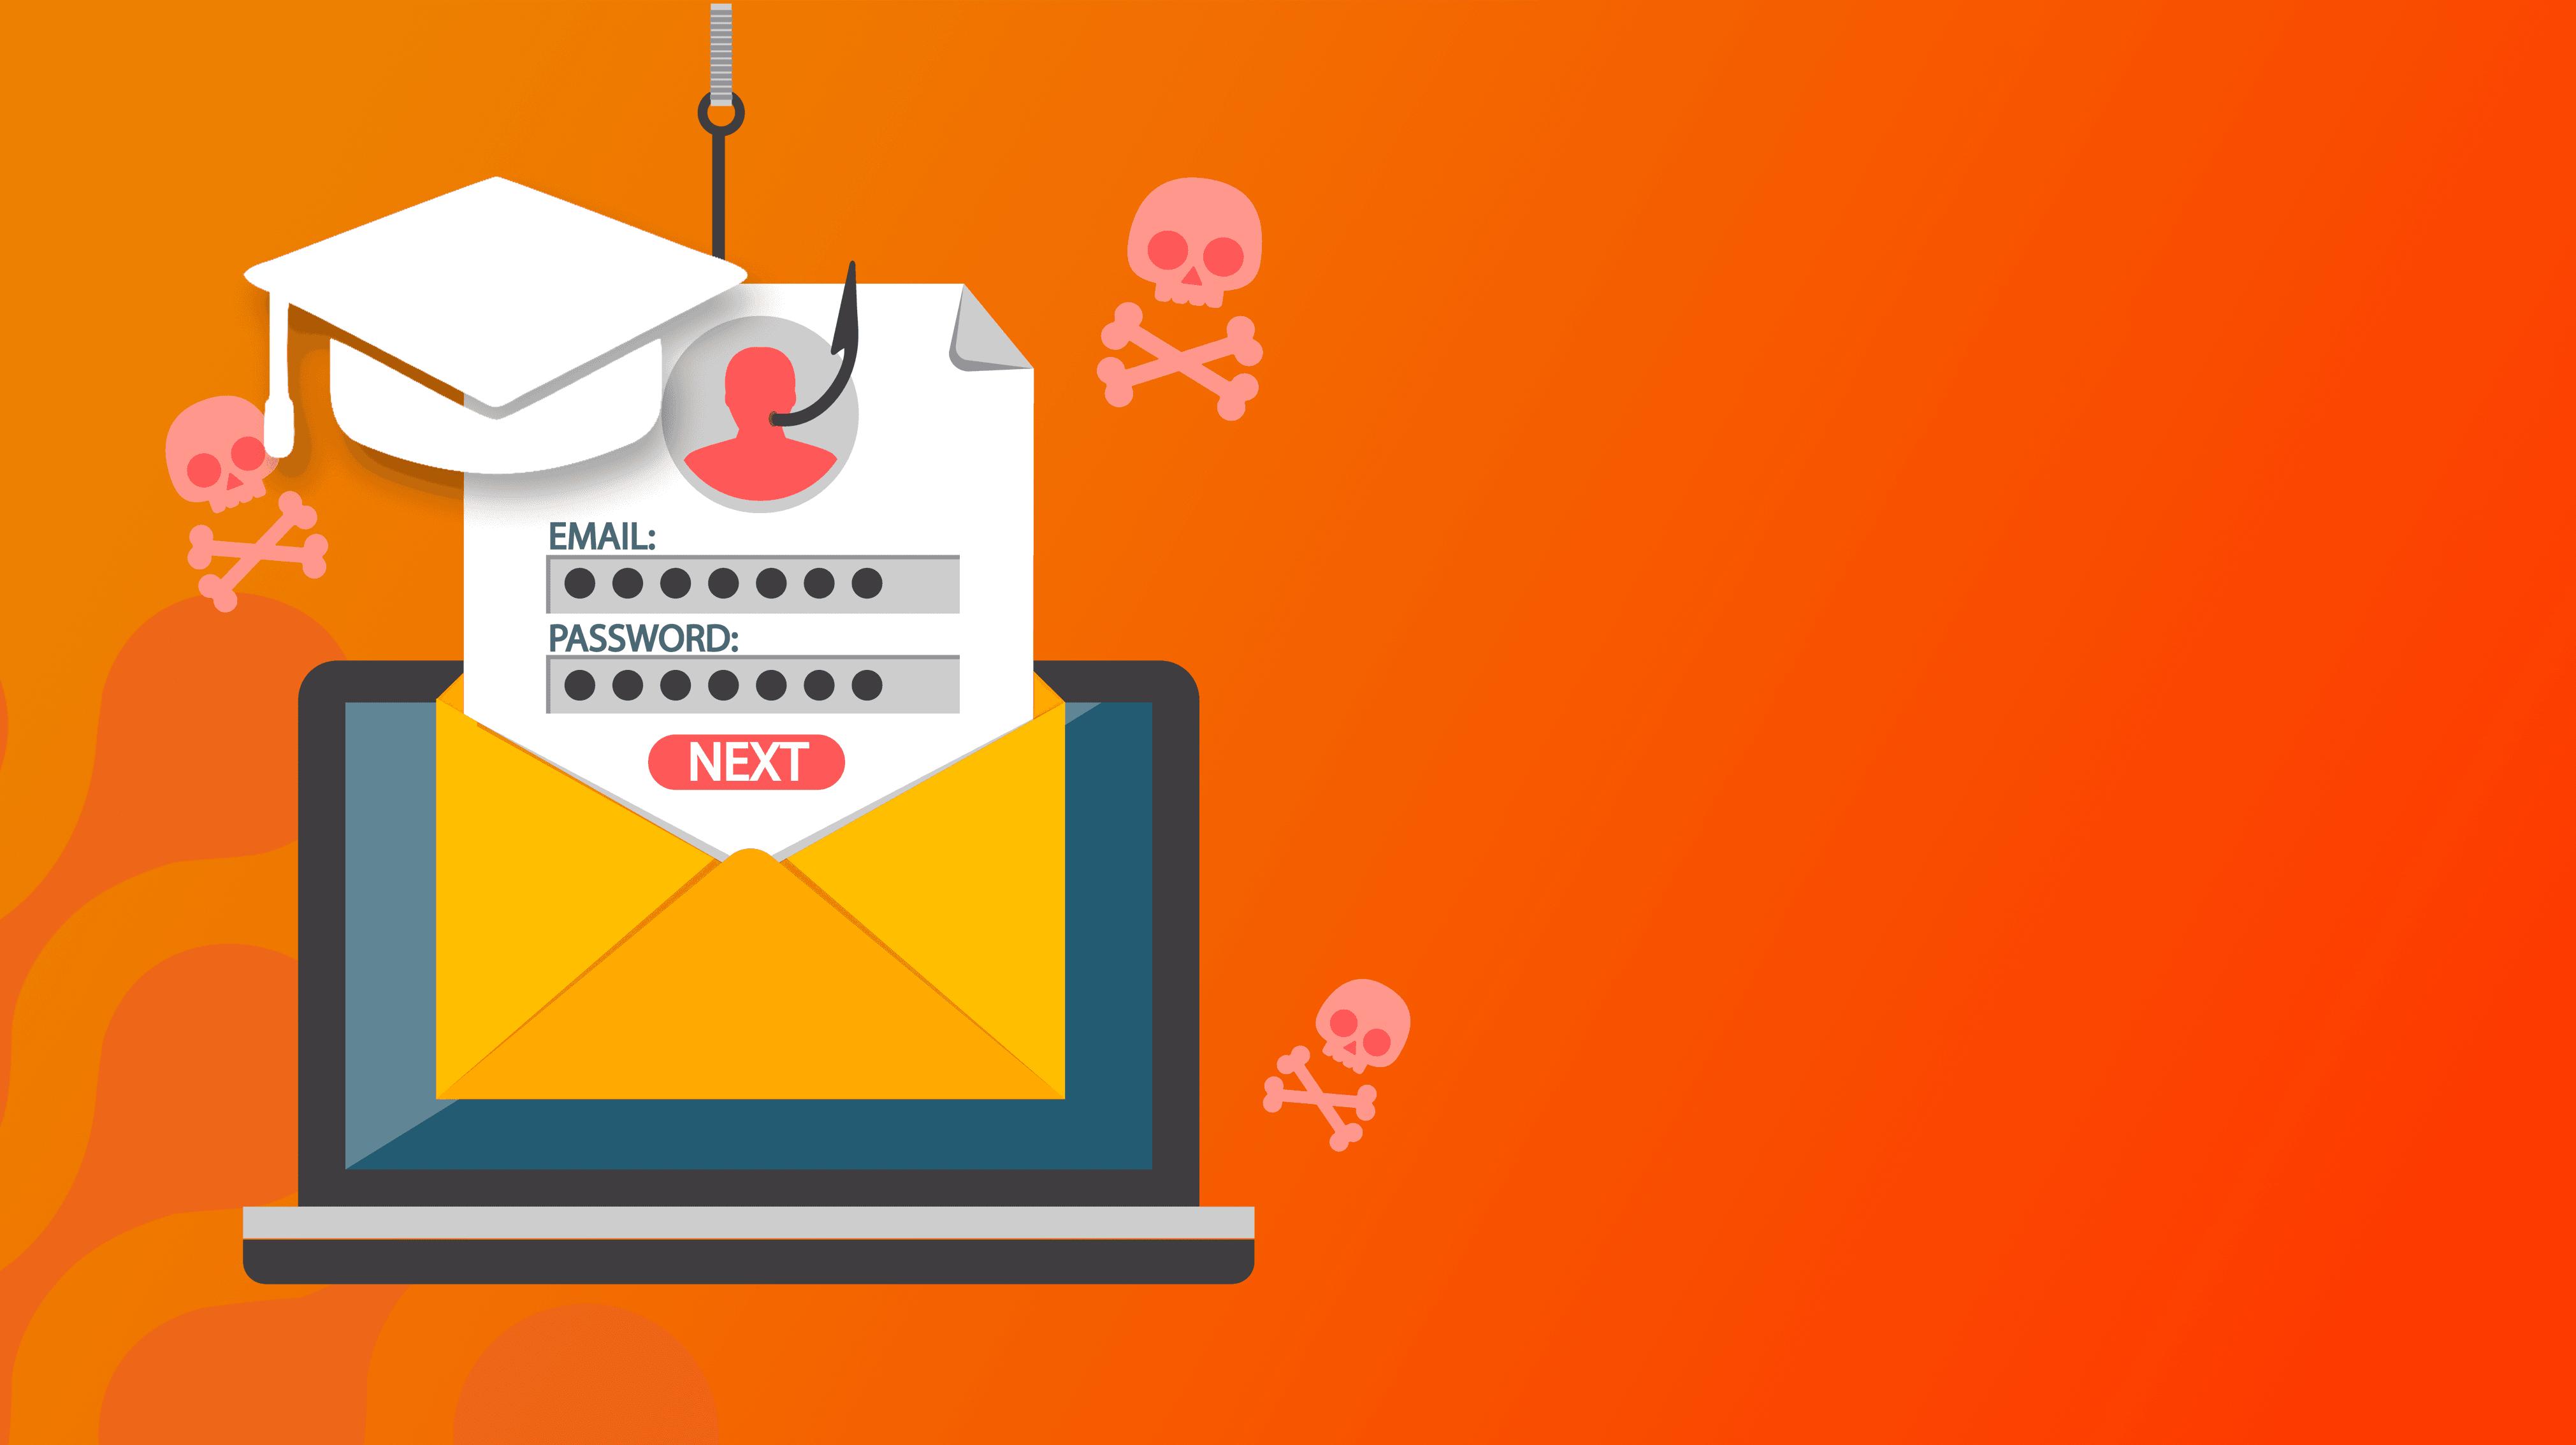 phishing training image